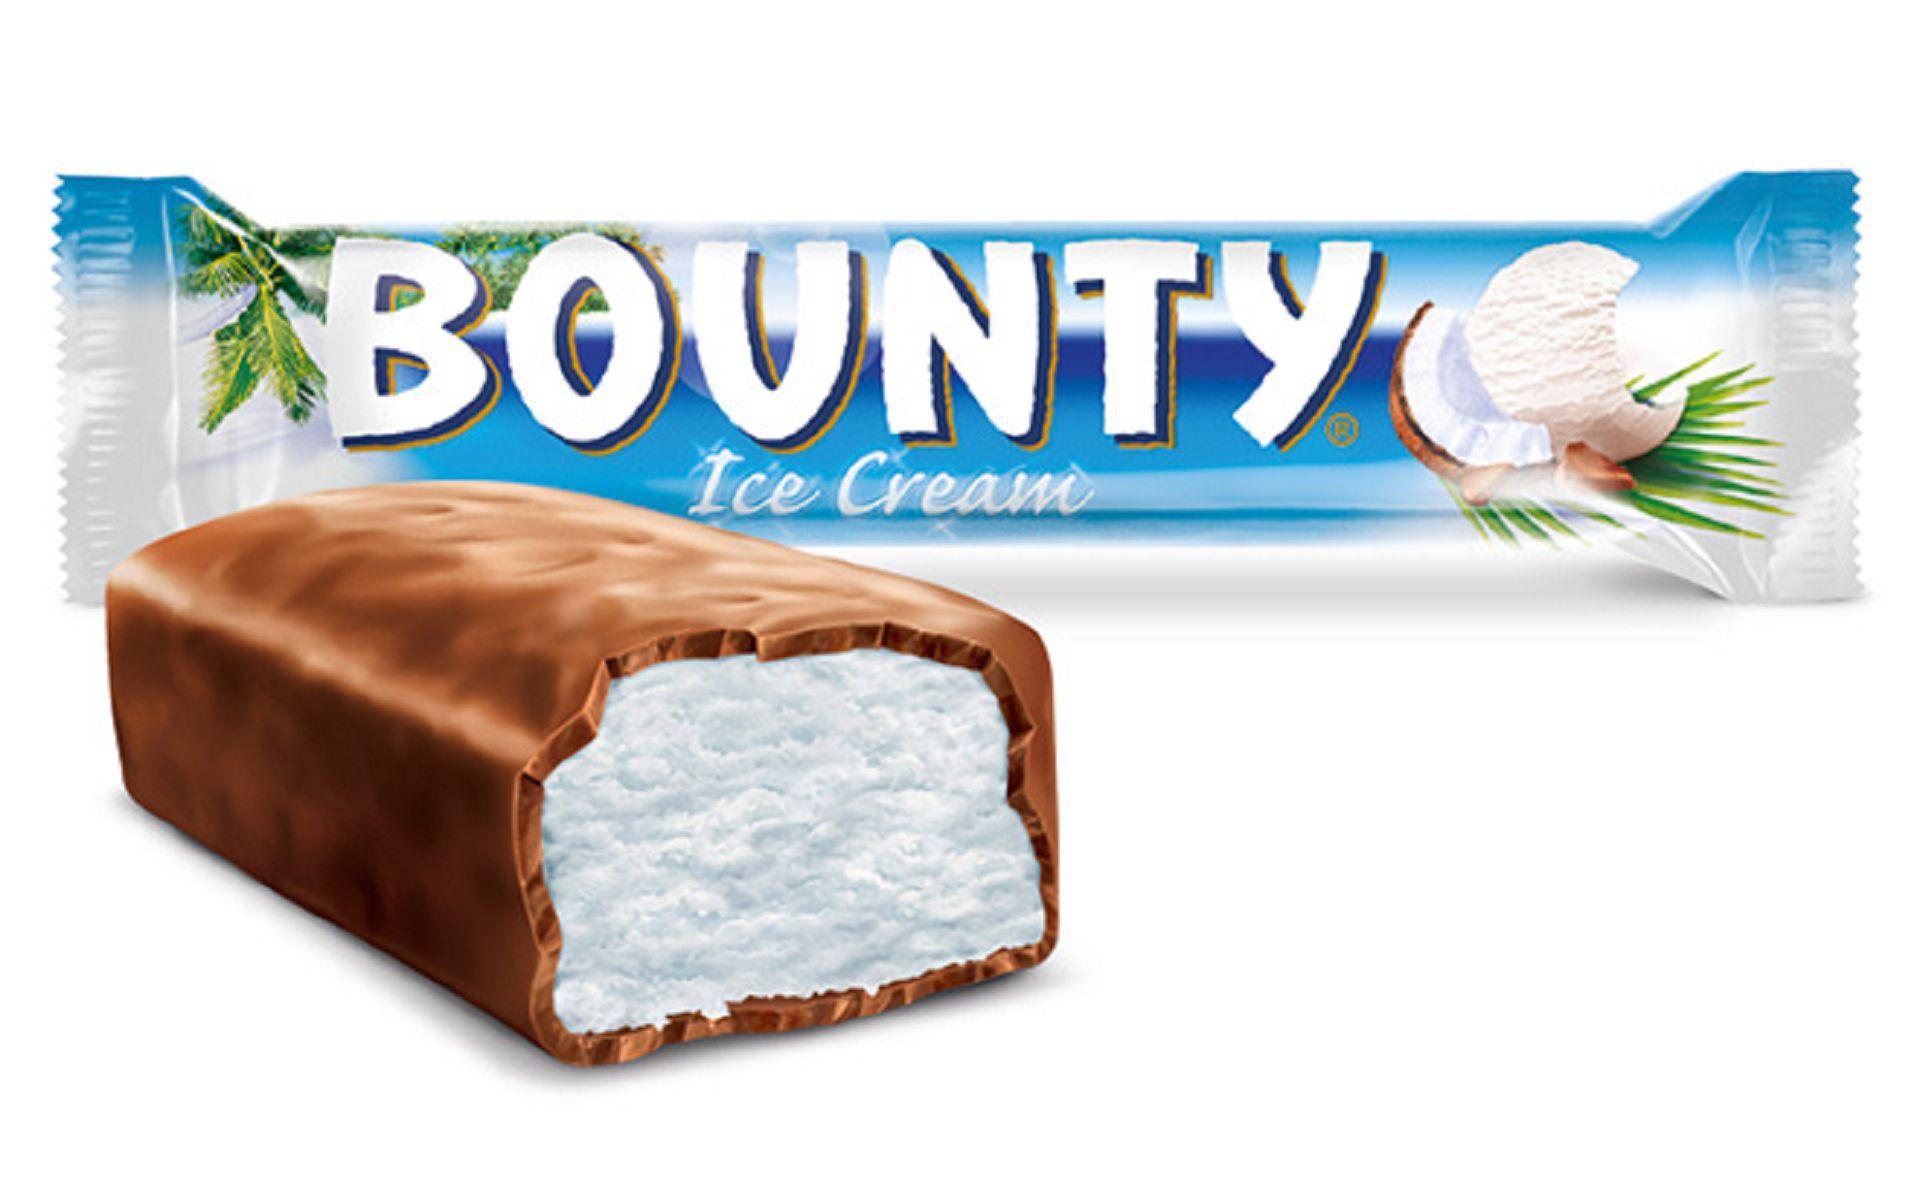 Bounty Widescreen